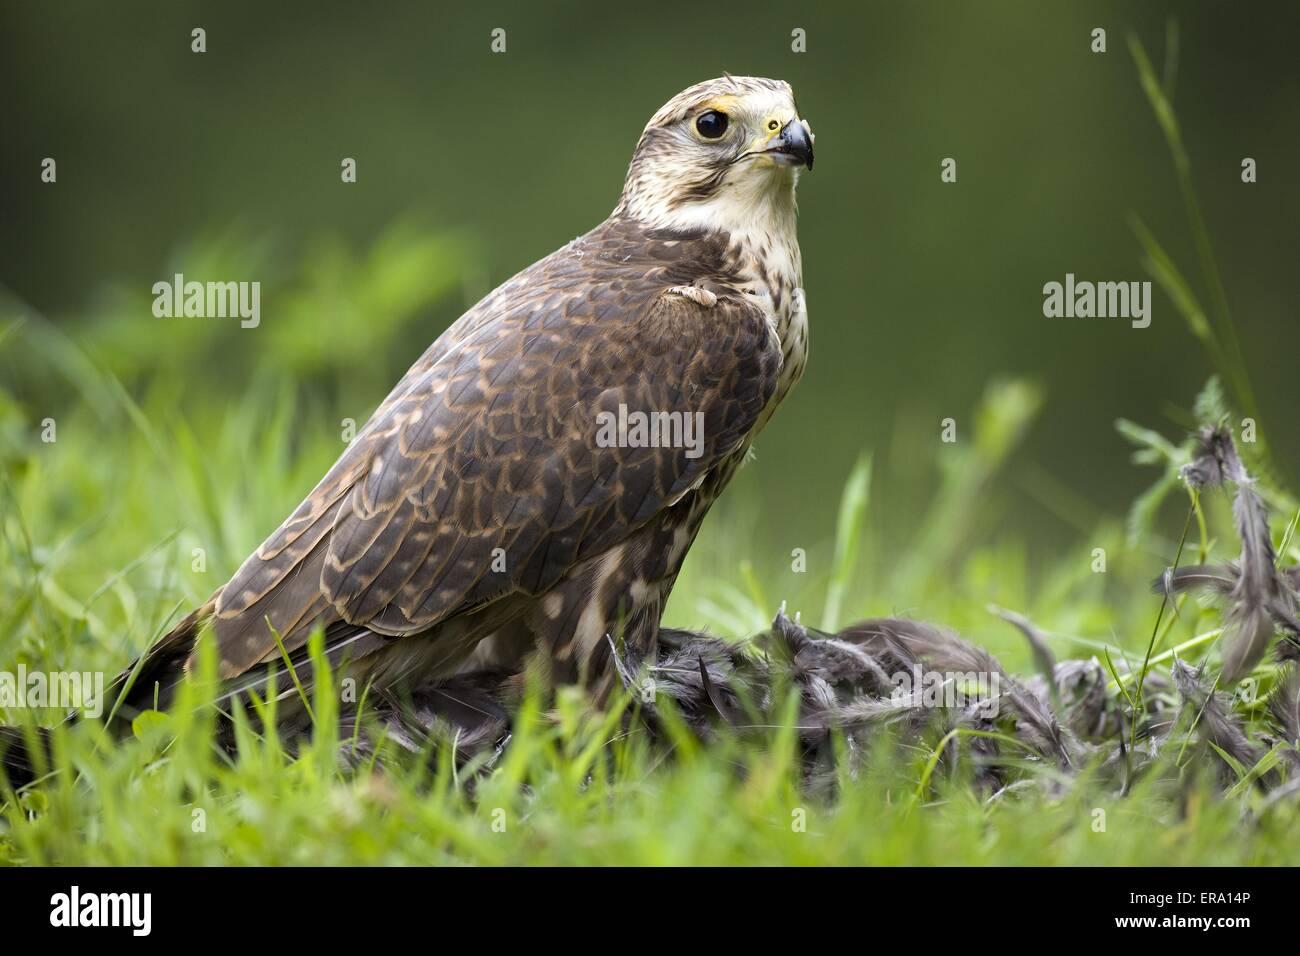 Saker falcon with prey - Stock Image